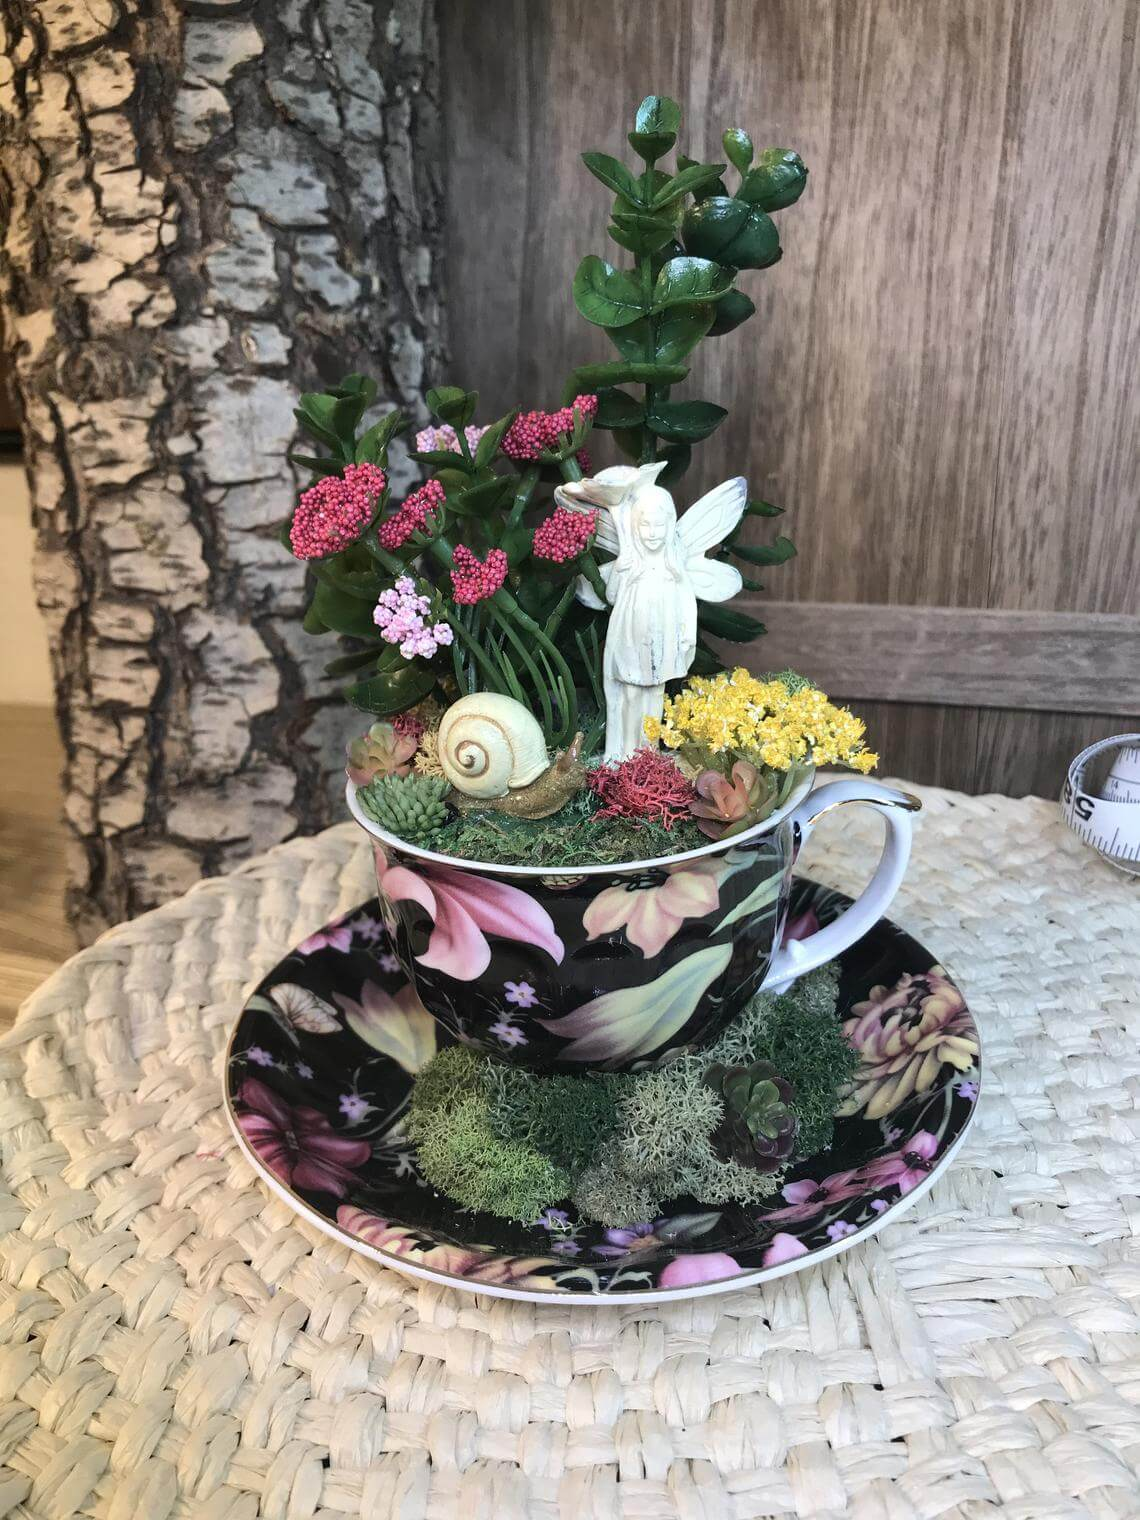 Miniature Fairy and Snail Statue Teacup Garden